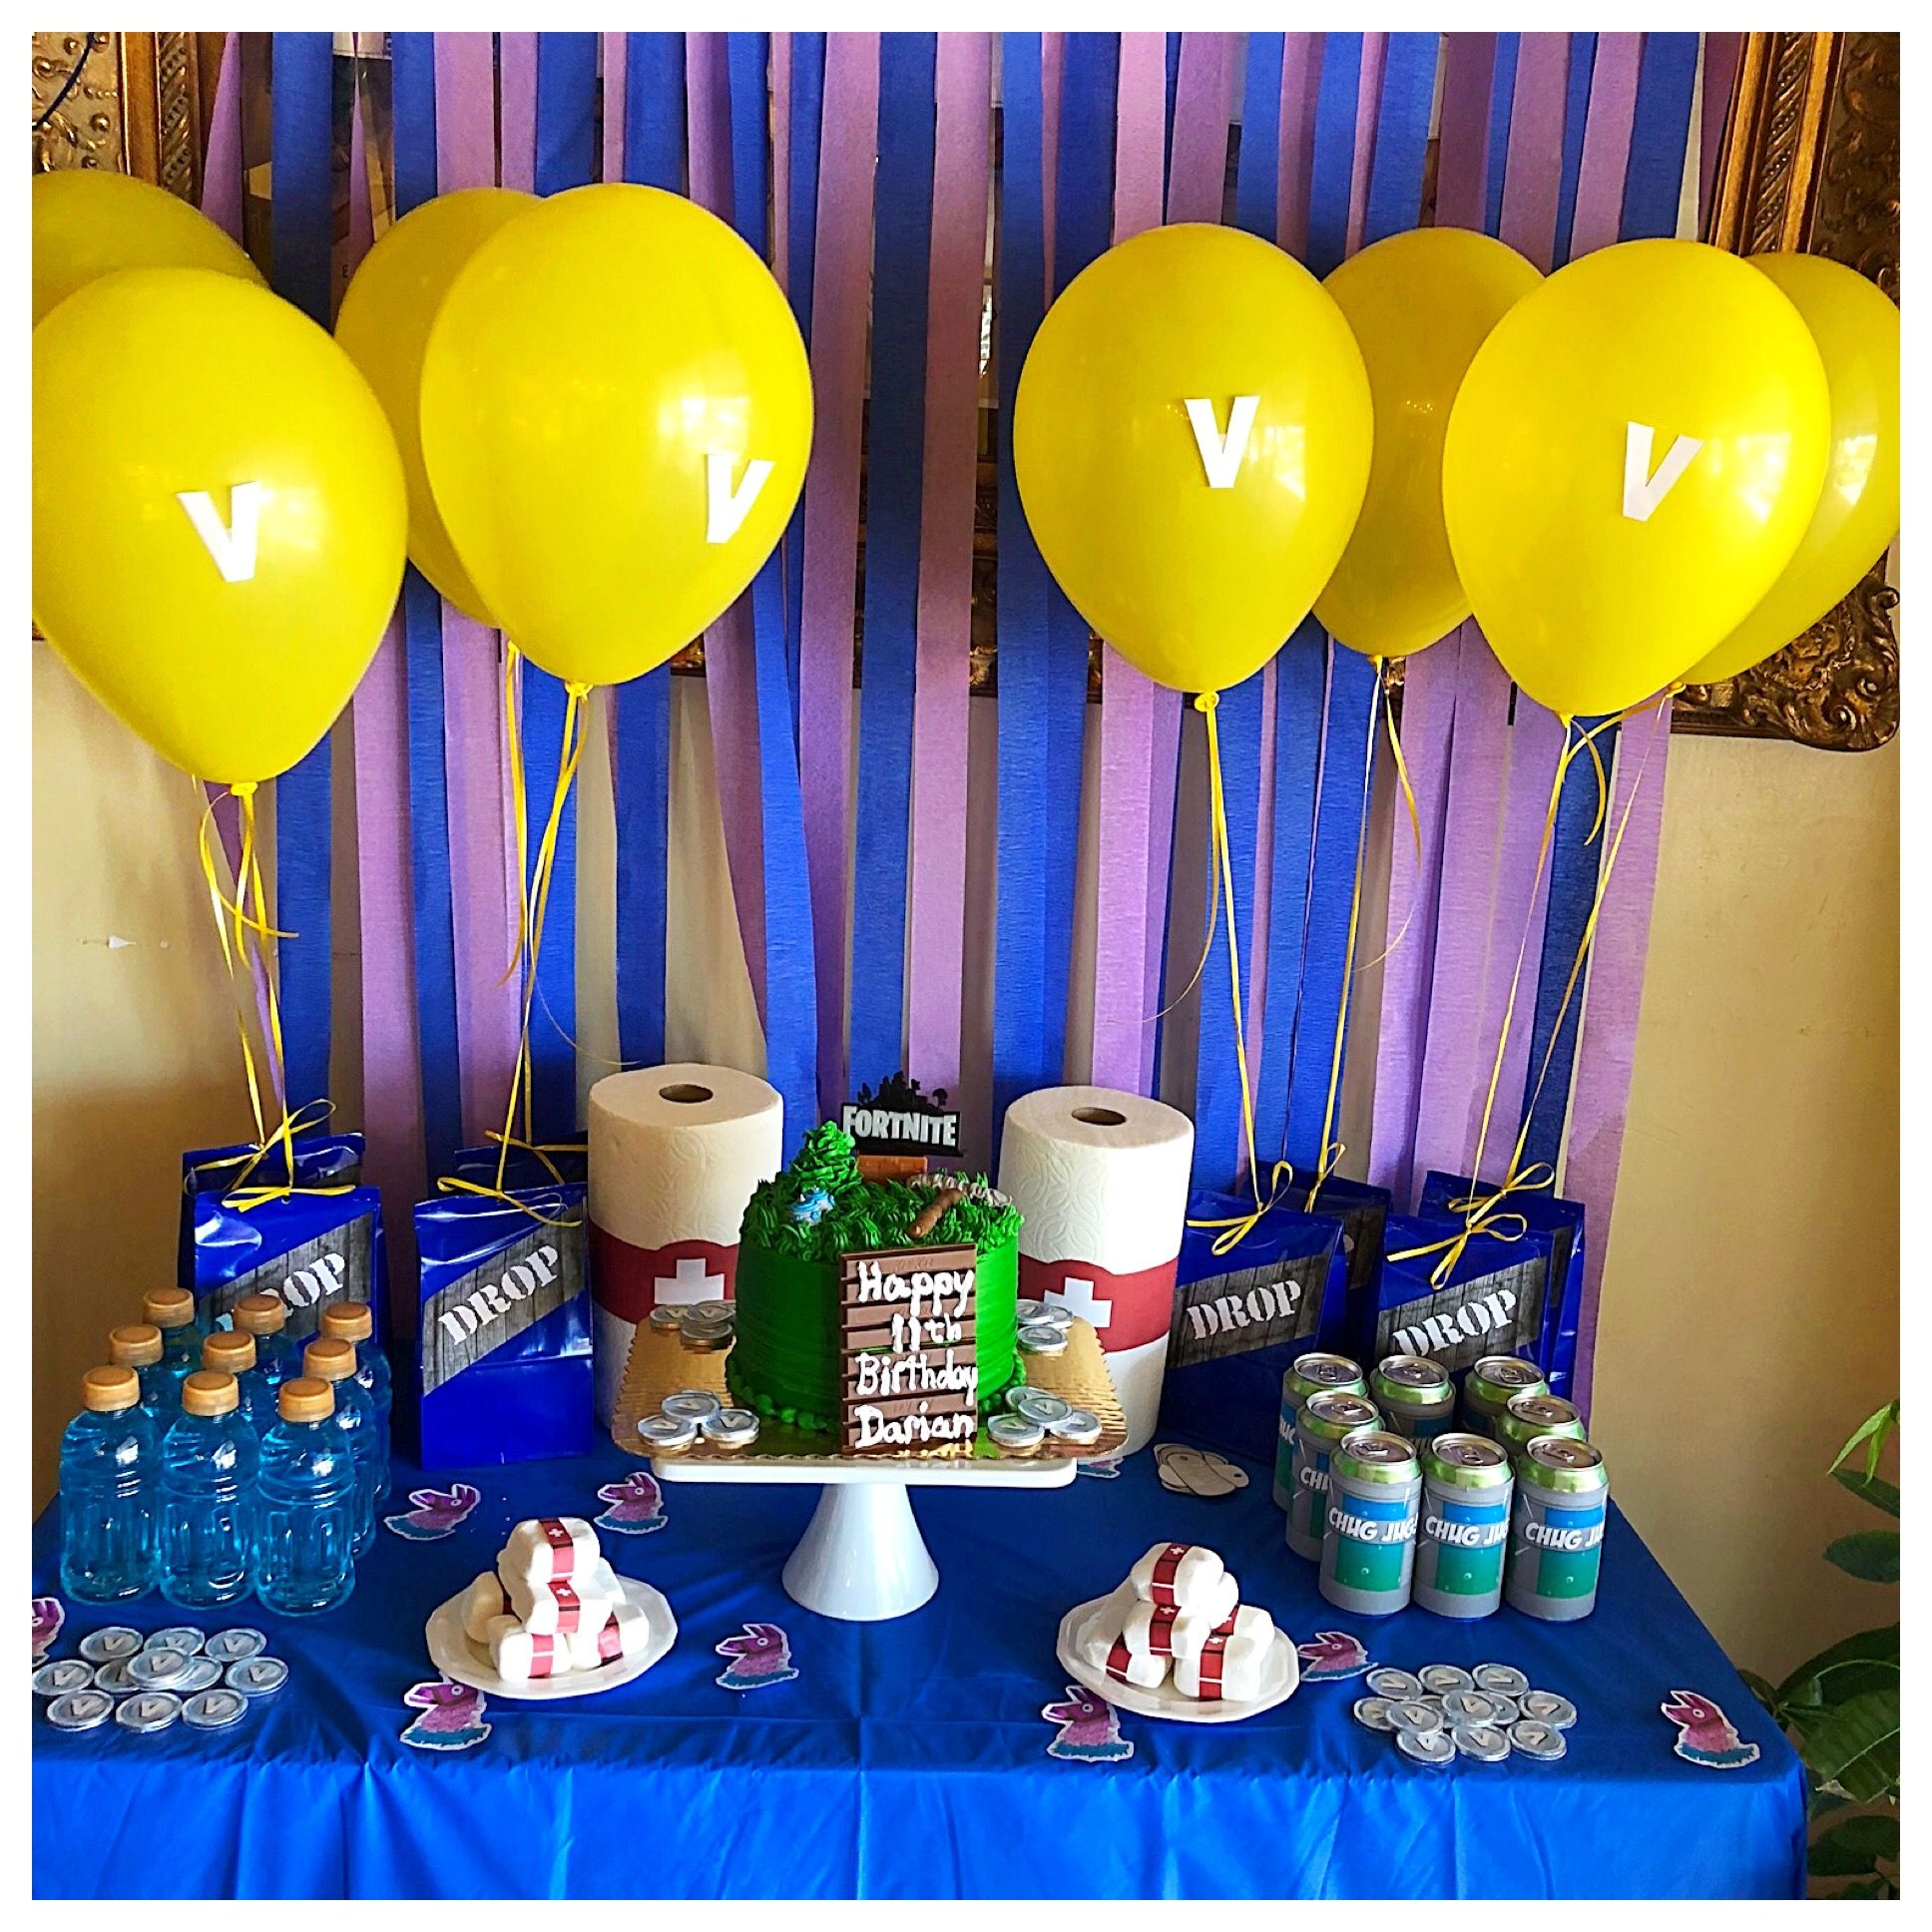 Fortnite Party Llama Cupcake Toppers Diy Inspired